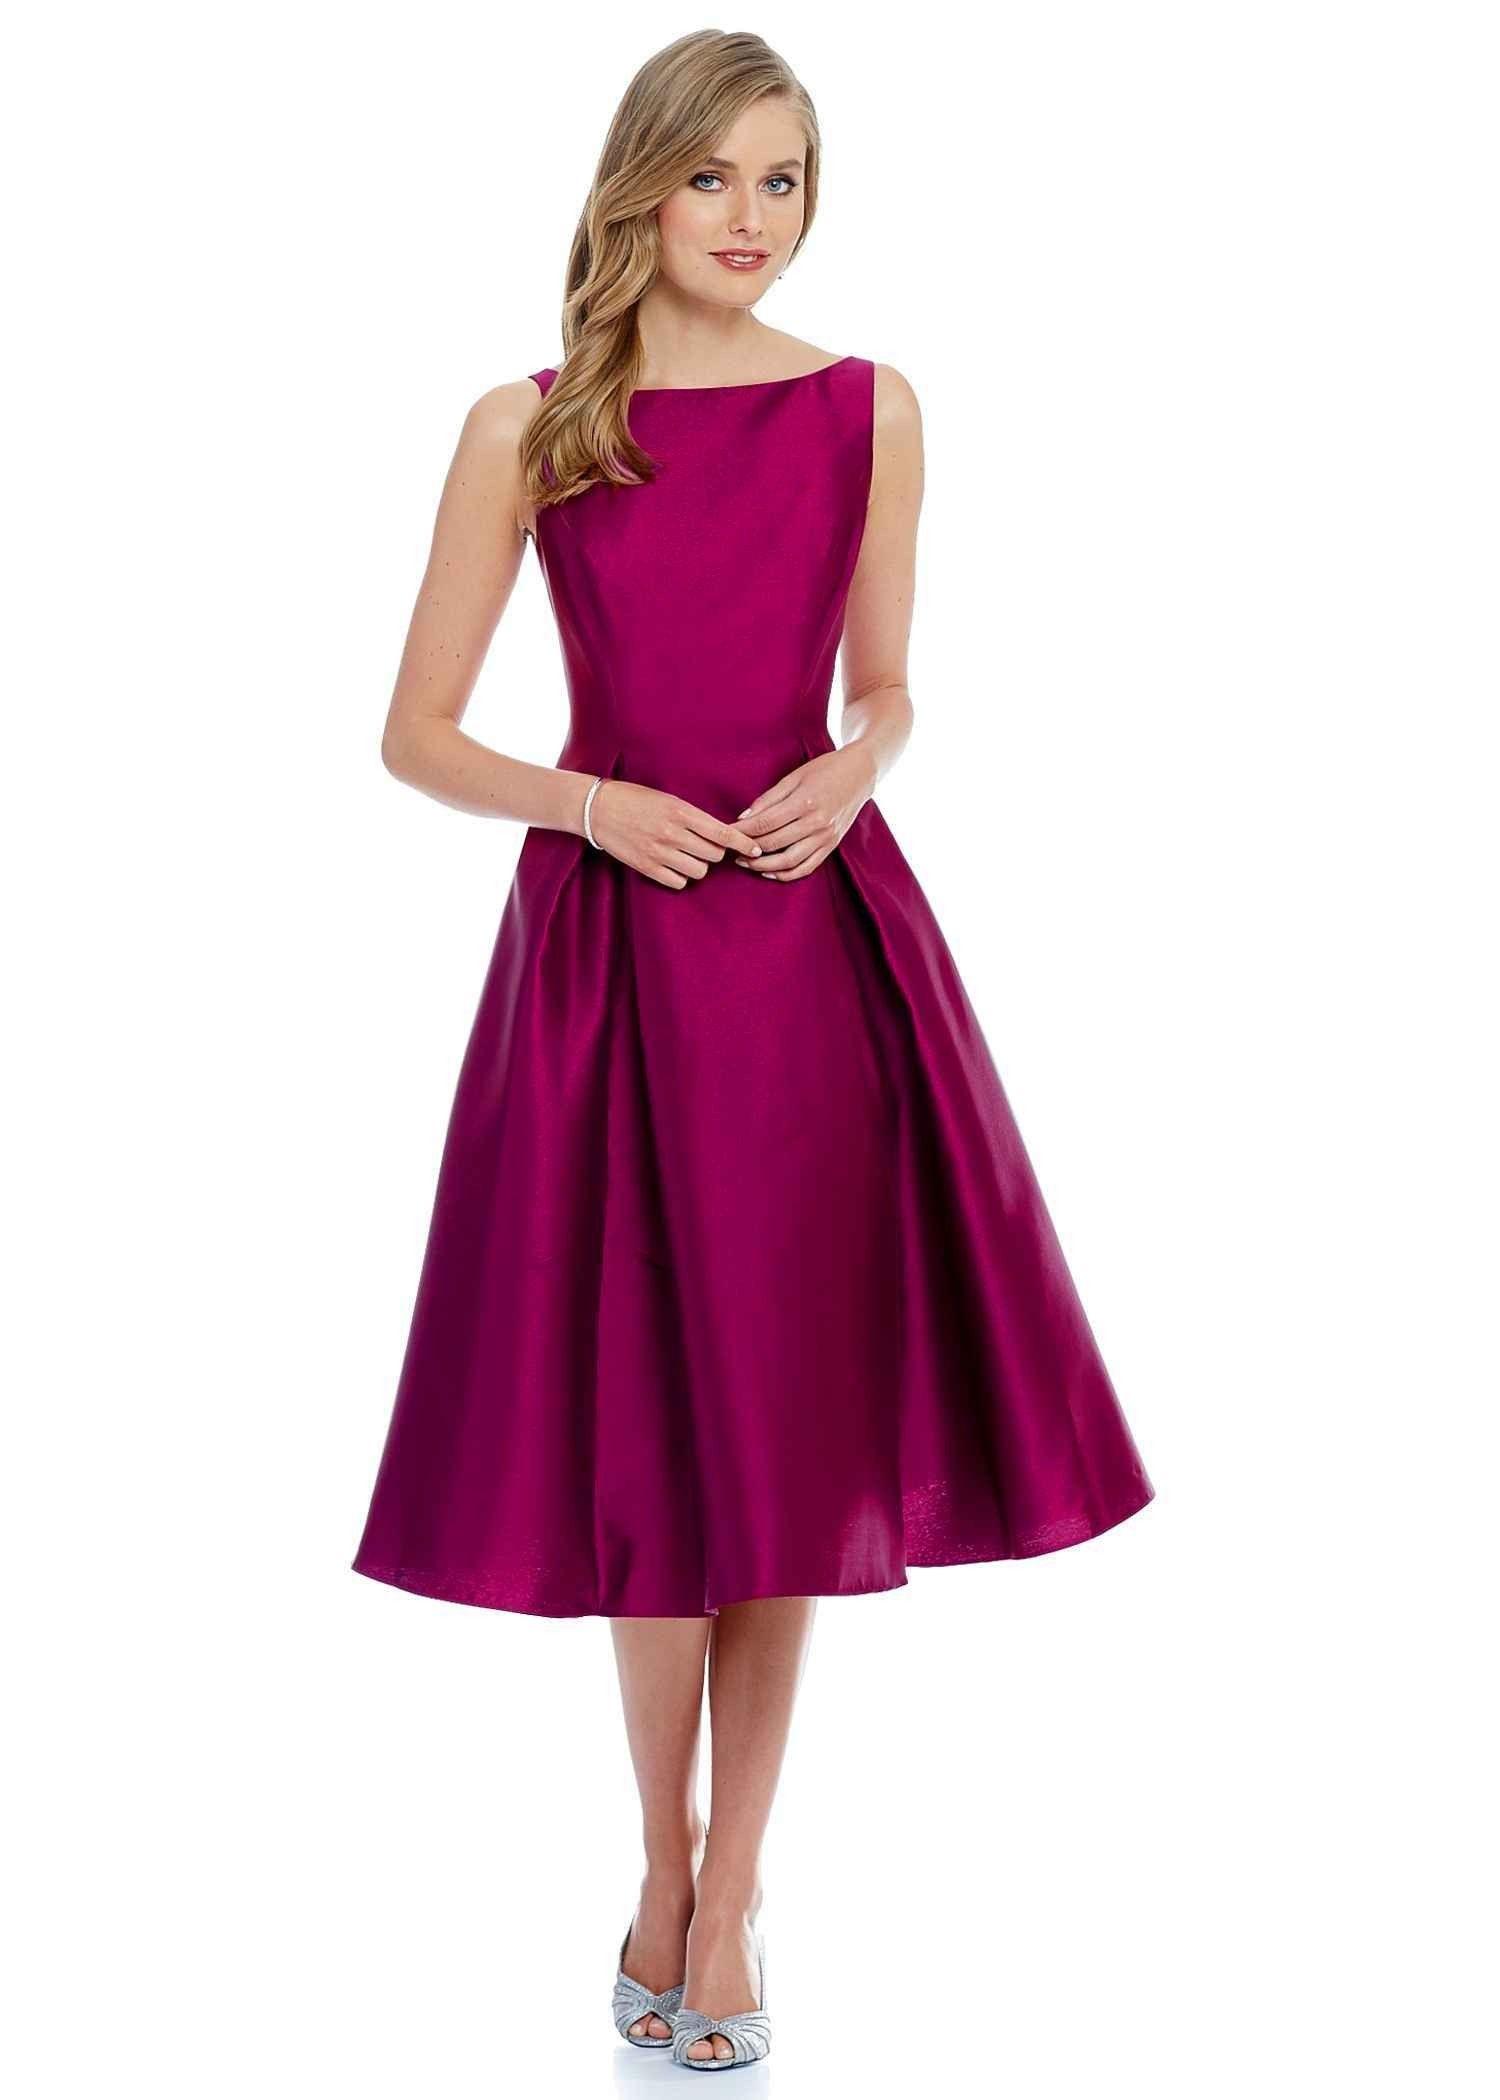 edc95e17768 Charmi Wine Color Designer Western Dress for Girl. | One Piece ...